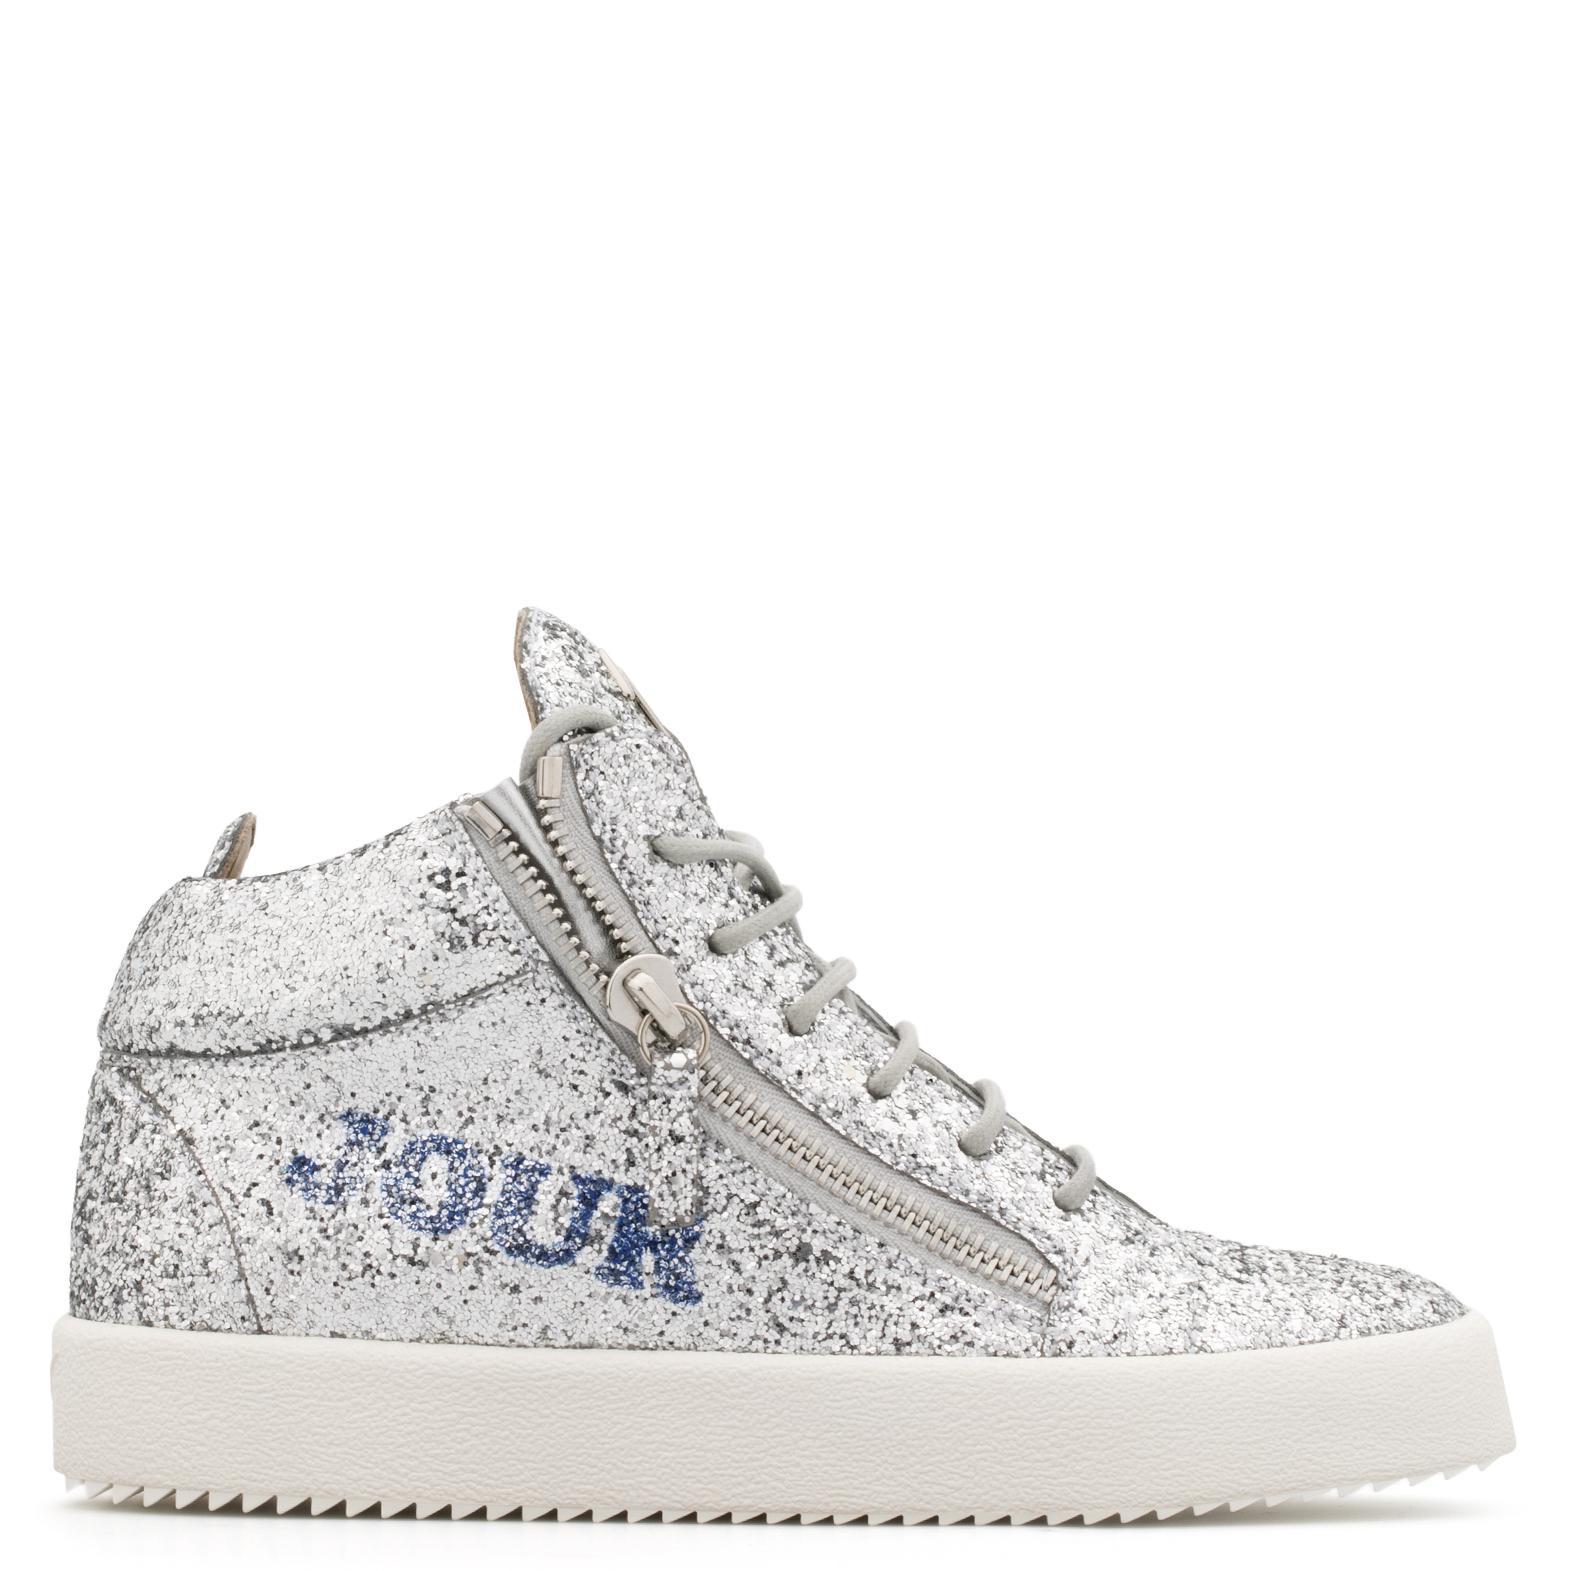 Giuseppe Zanotti Glitter low-top sneaker with 'Bonjour Nuit' motif BONJOUR NUIT S3HShgvFz3